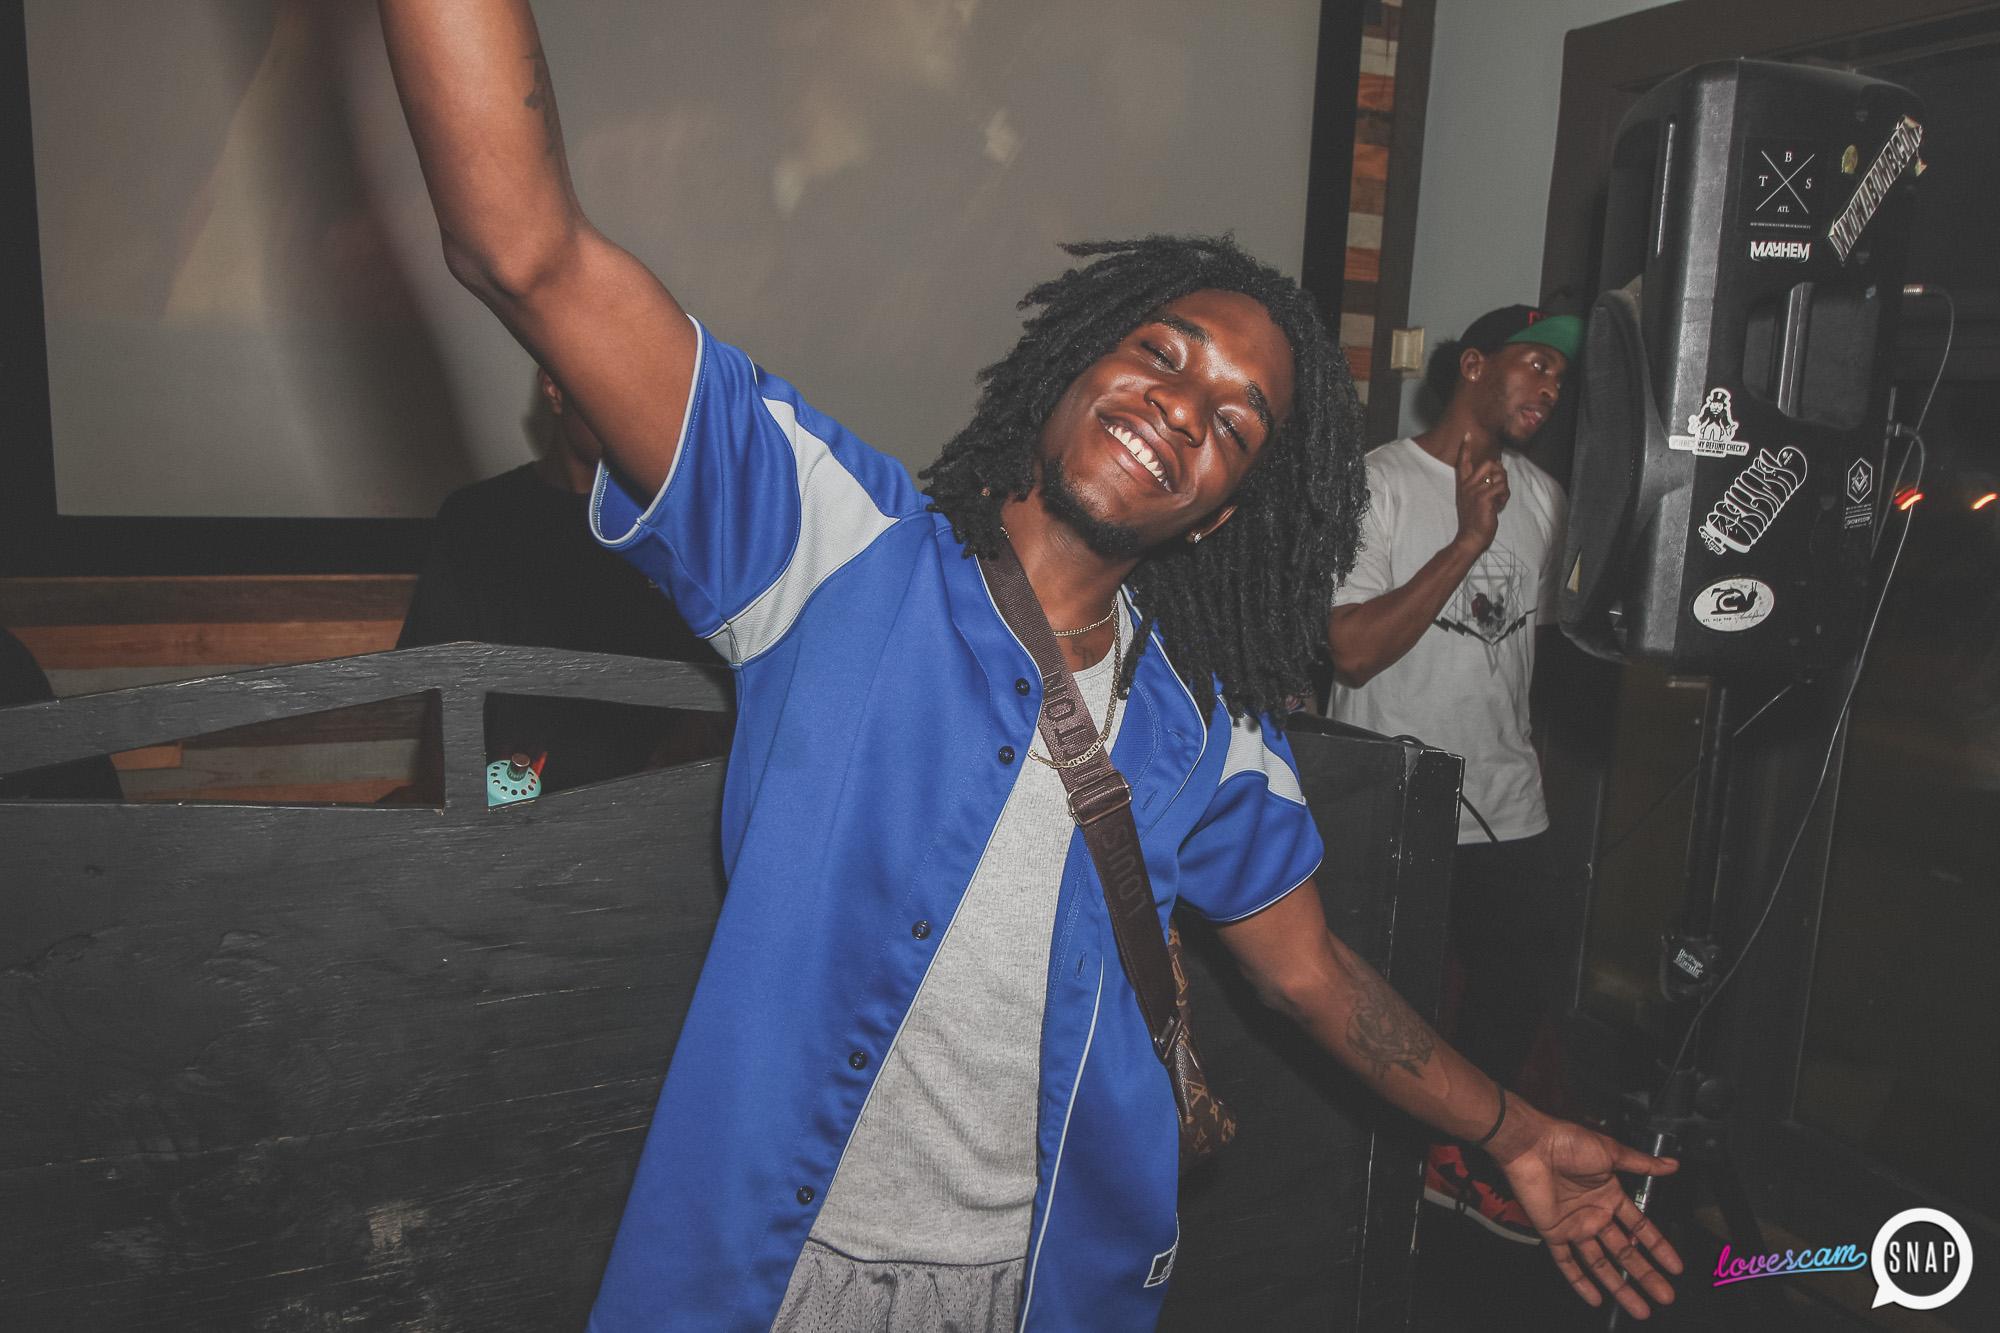 Lovescam 7.6.19 Oh Snap Kid Colin Boddy Atlanta-128.jpg